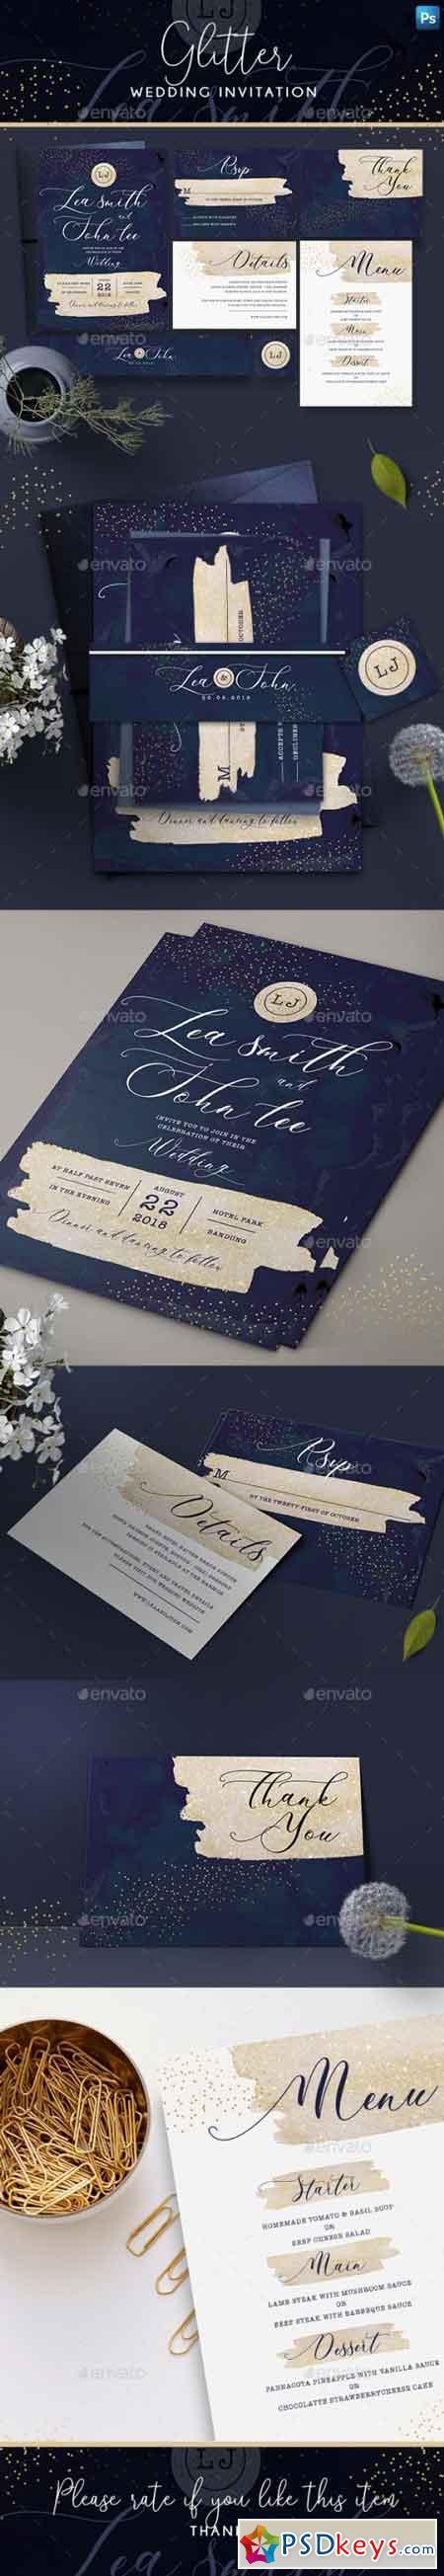 Glitter Wedding Invitation 22001004